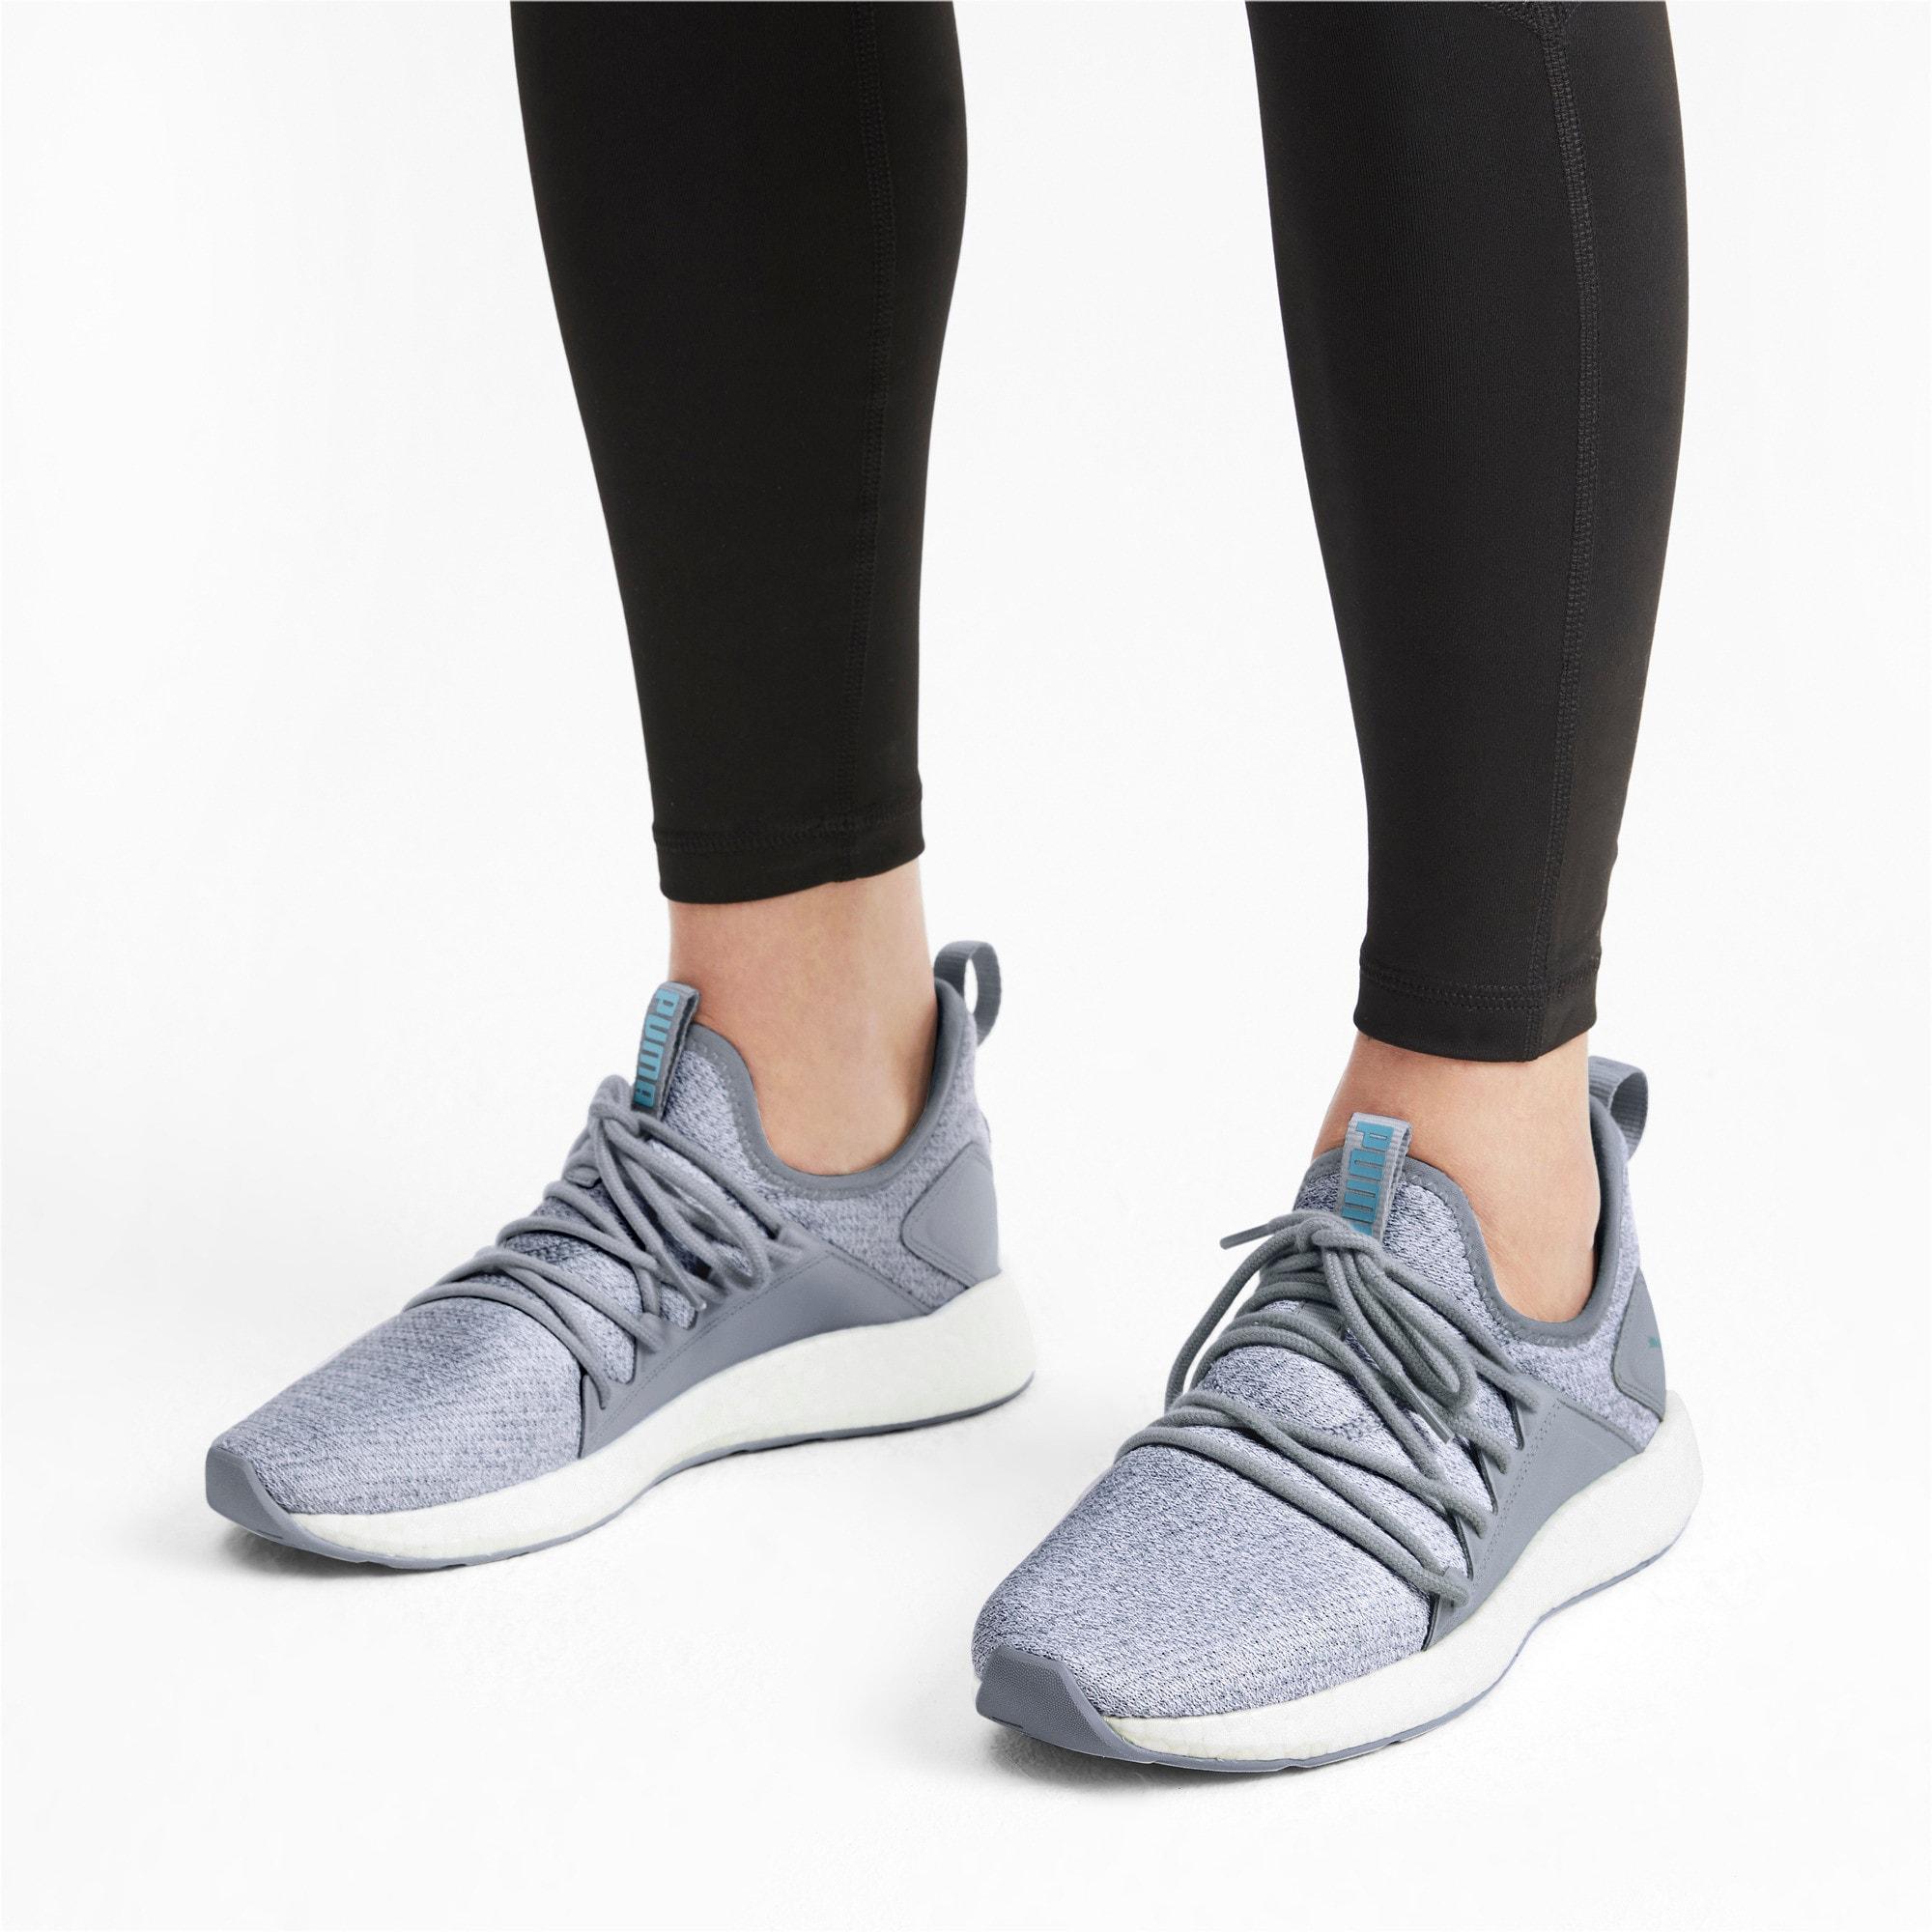 Thumbnail 3 of NRGY Neko Knit Women's Running Shoes, Quarry, medium-IND